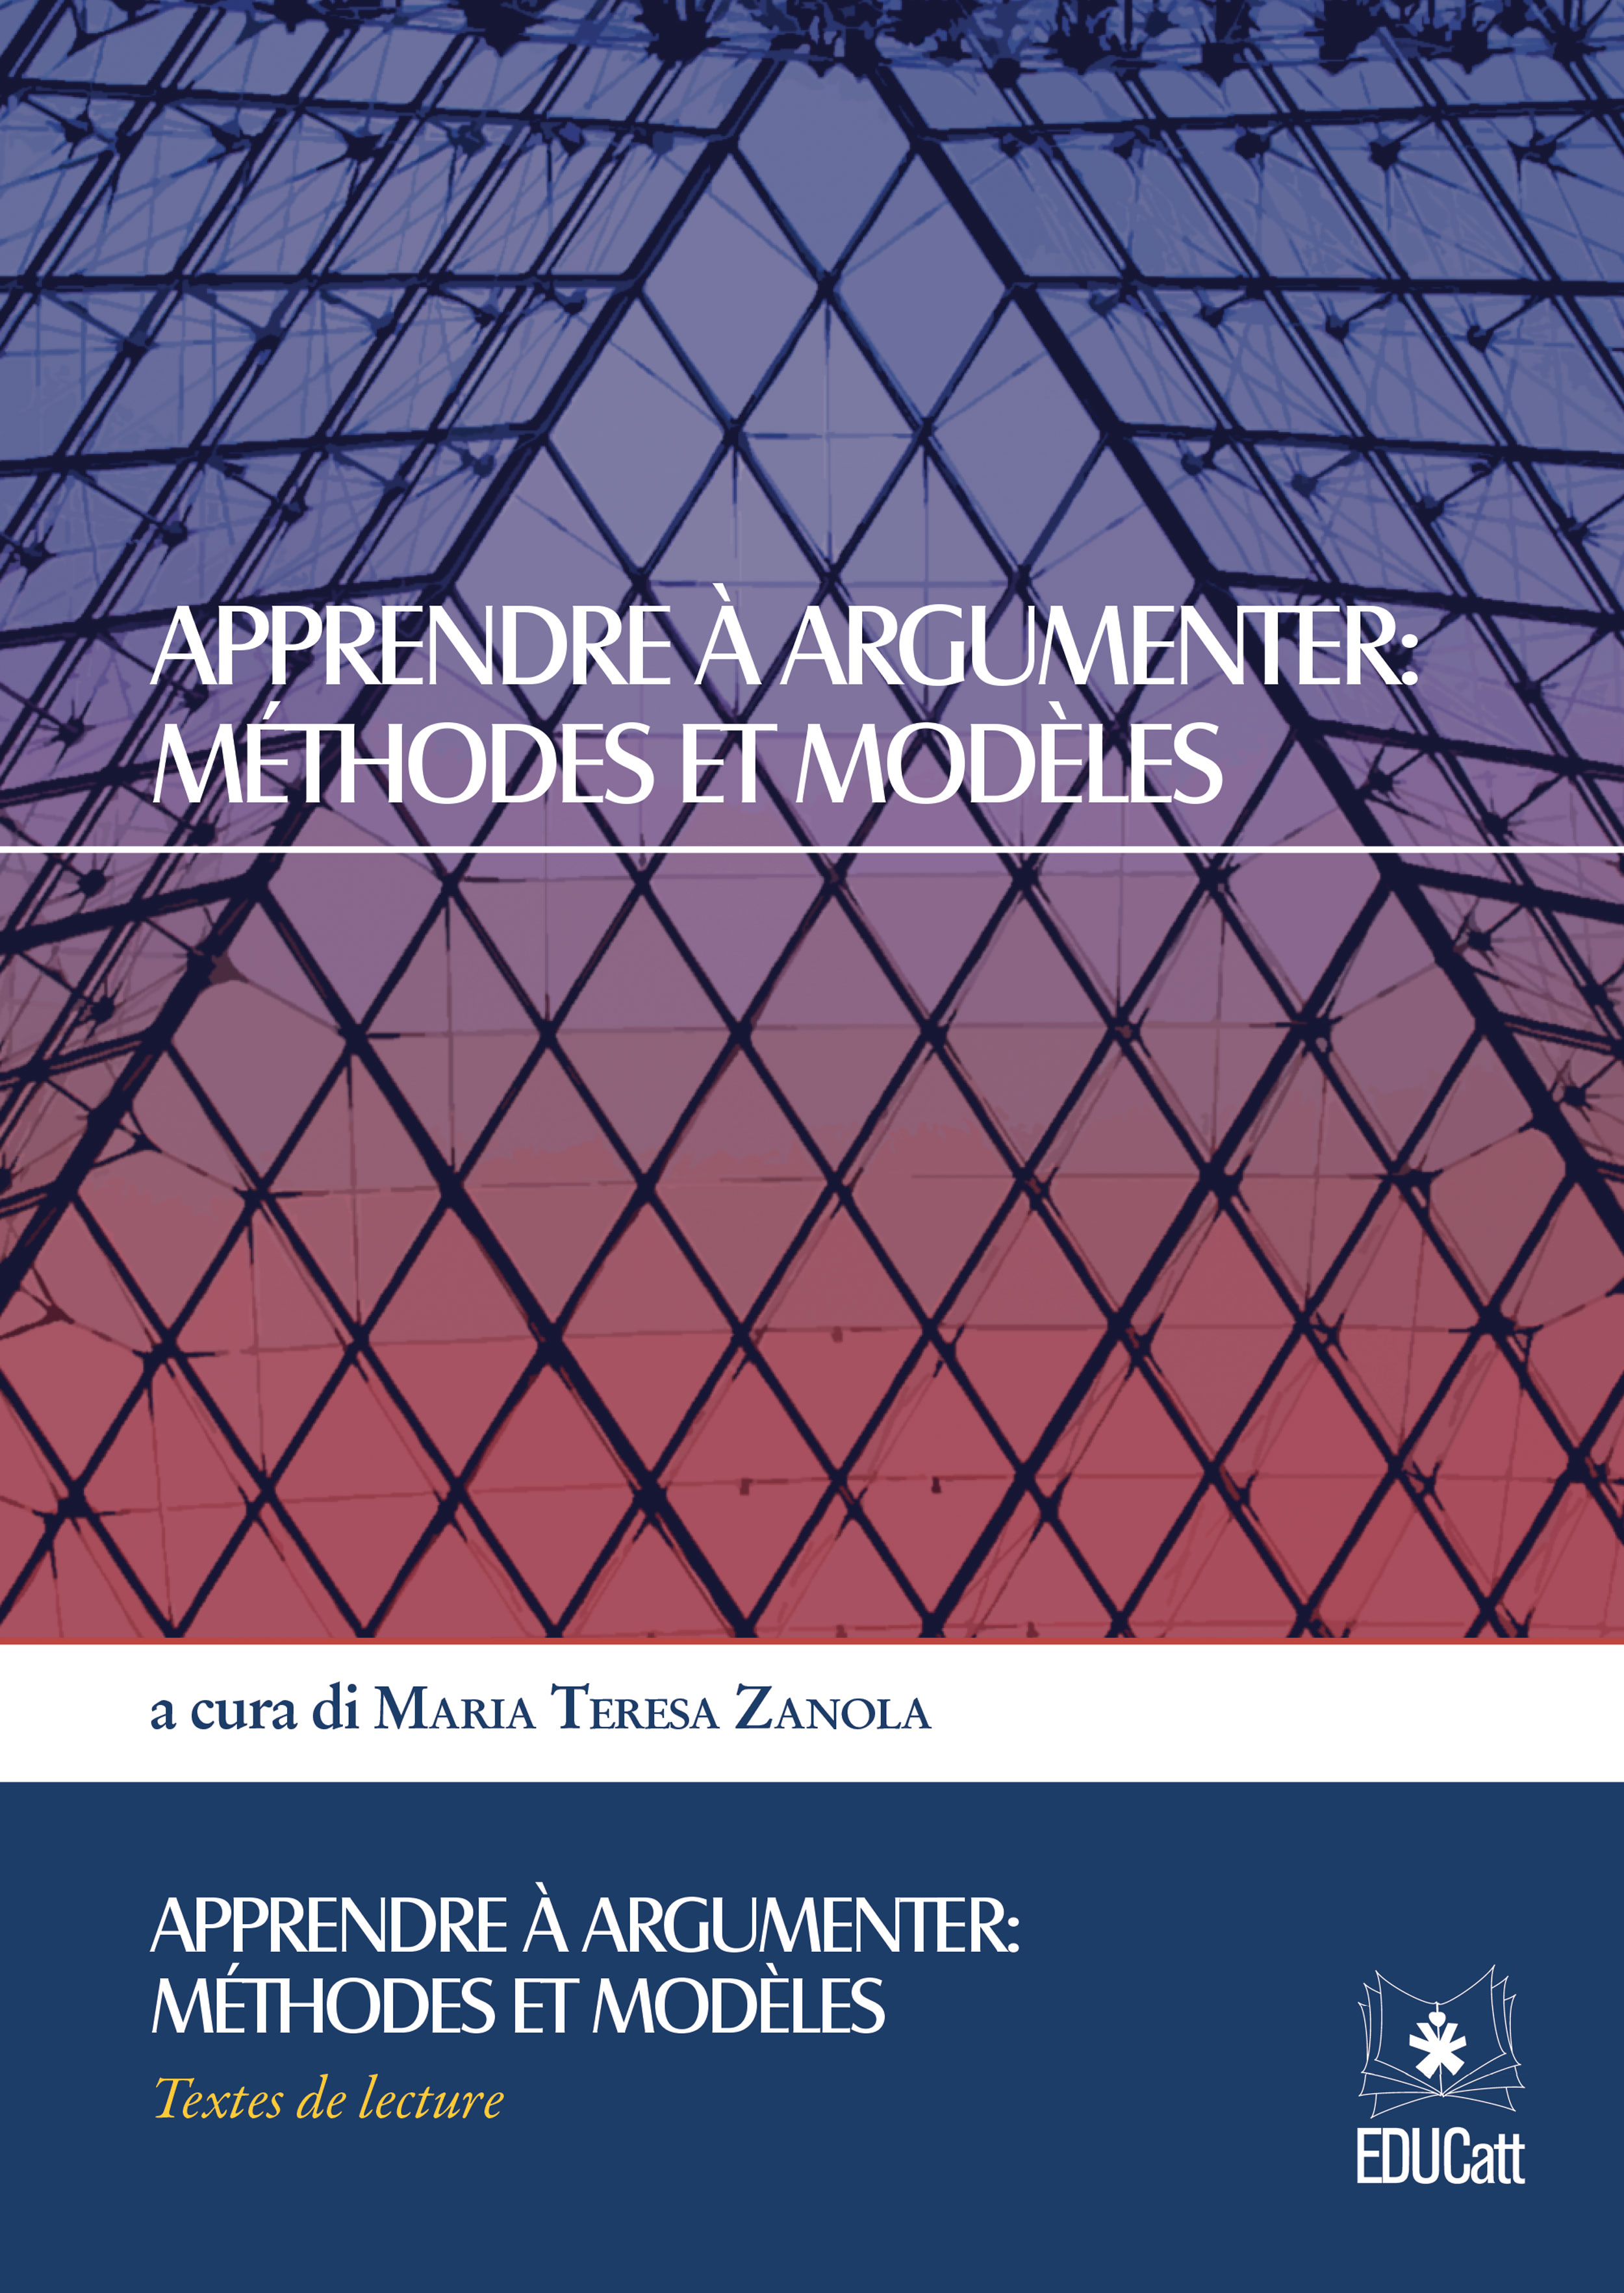 APPRENDRE A ARGUMENTER: METHODES ET MODELES